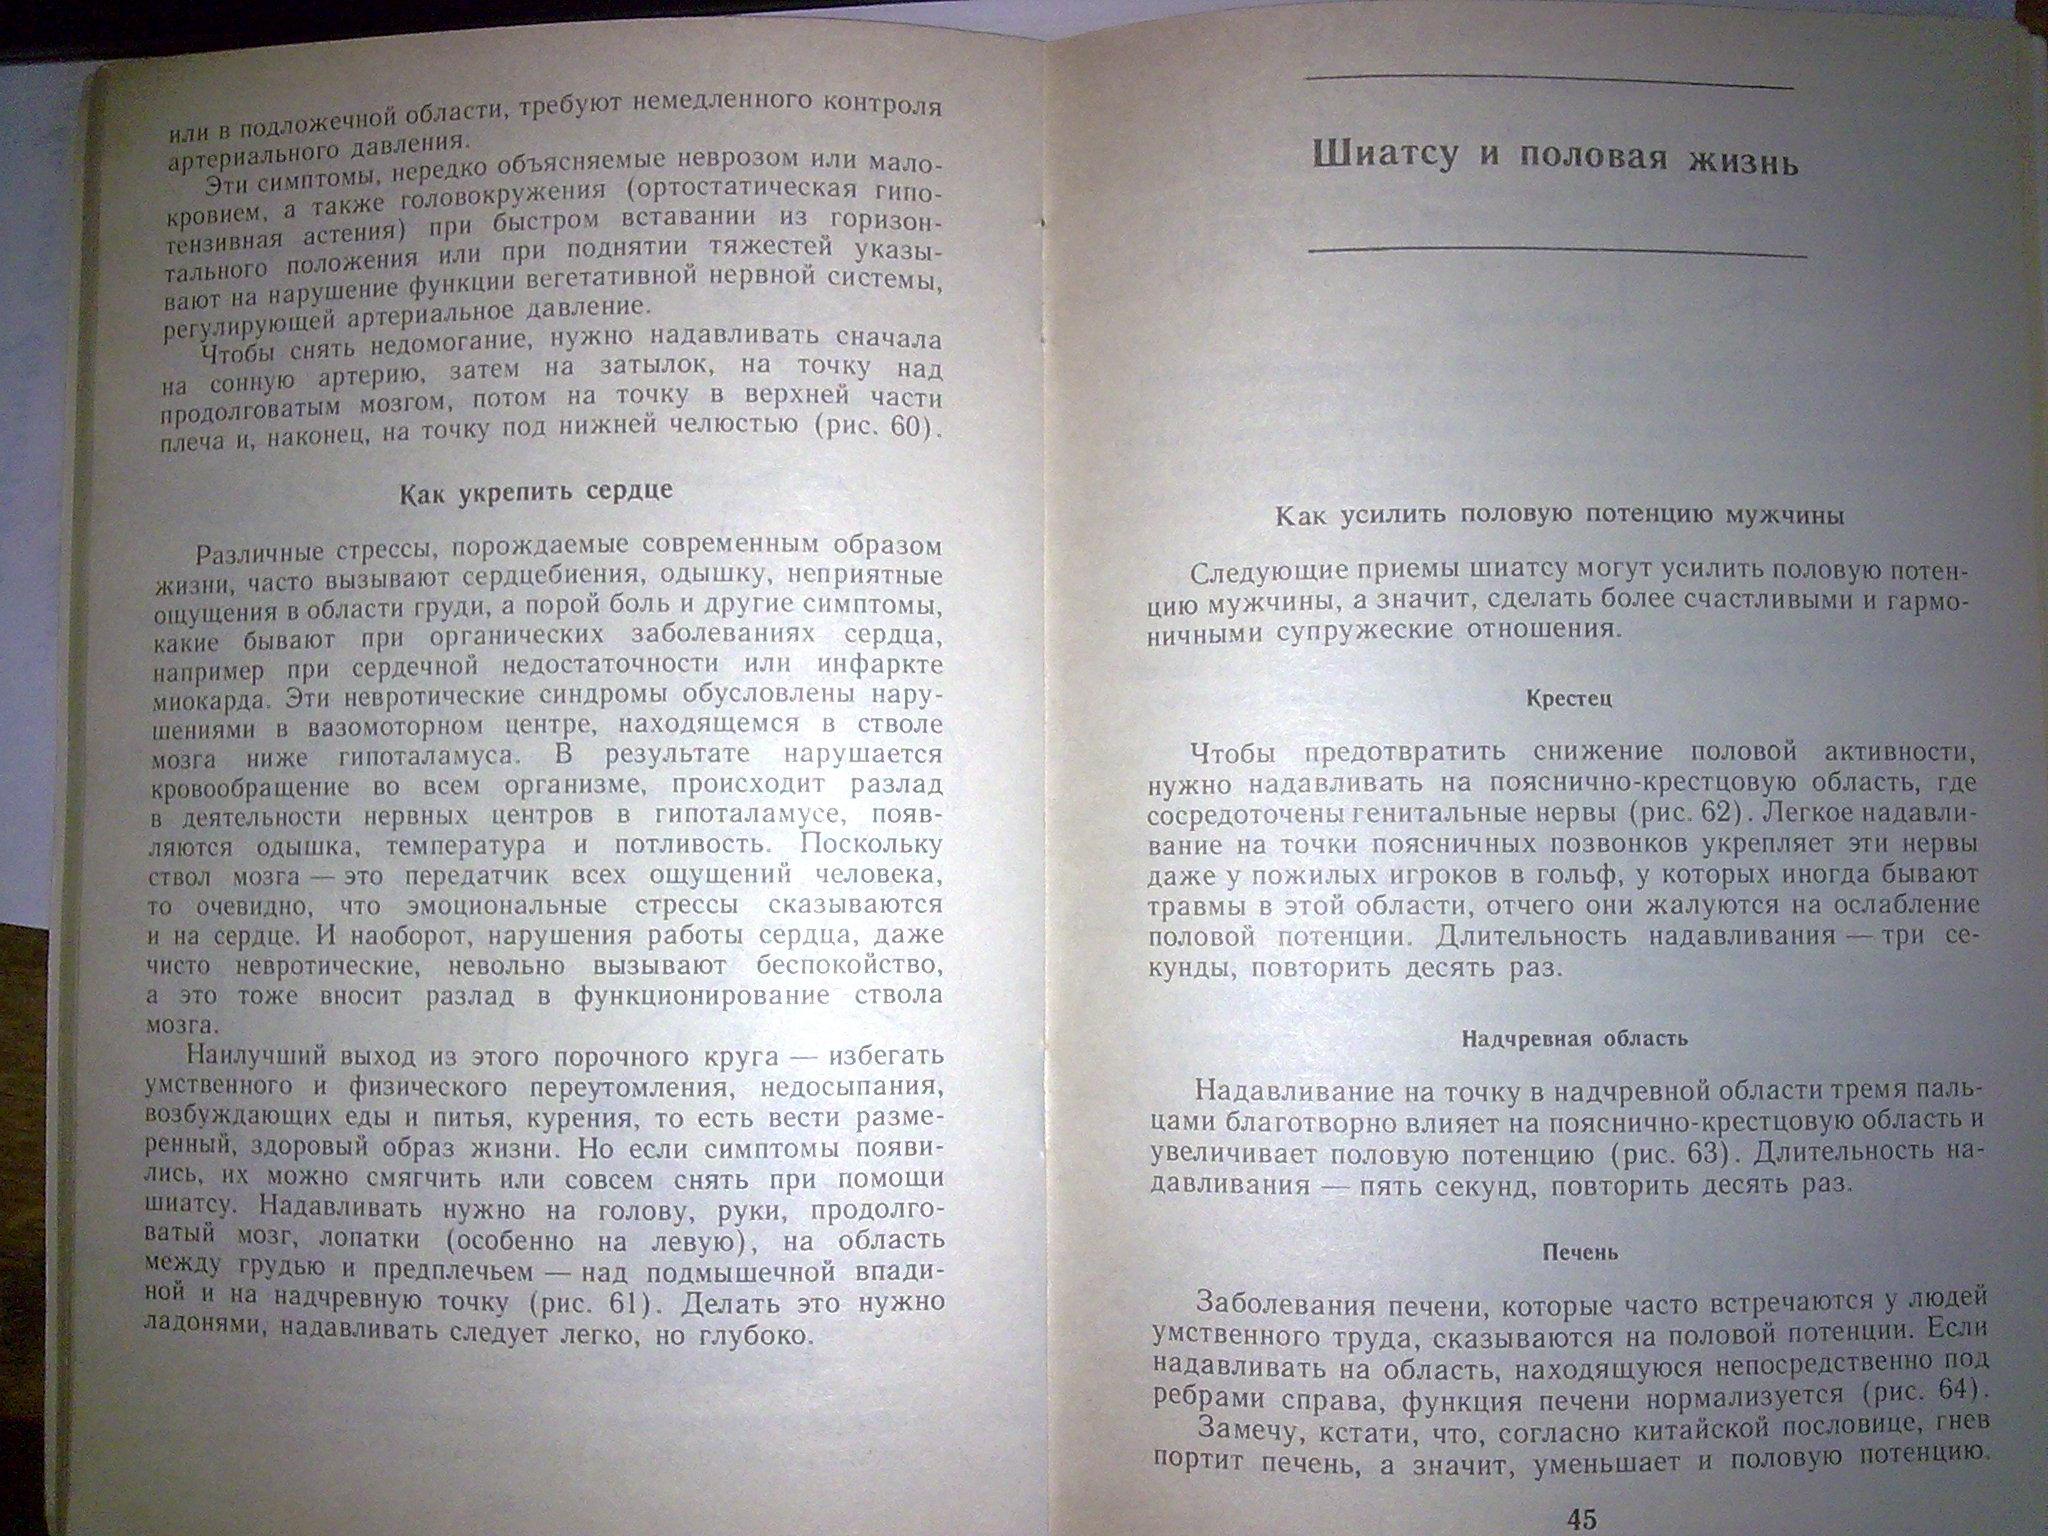 http://forumupload.ru/uploads/0001/48/78/17182-2-f.jpg